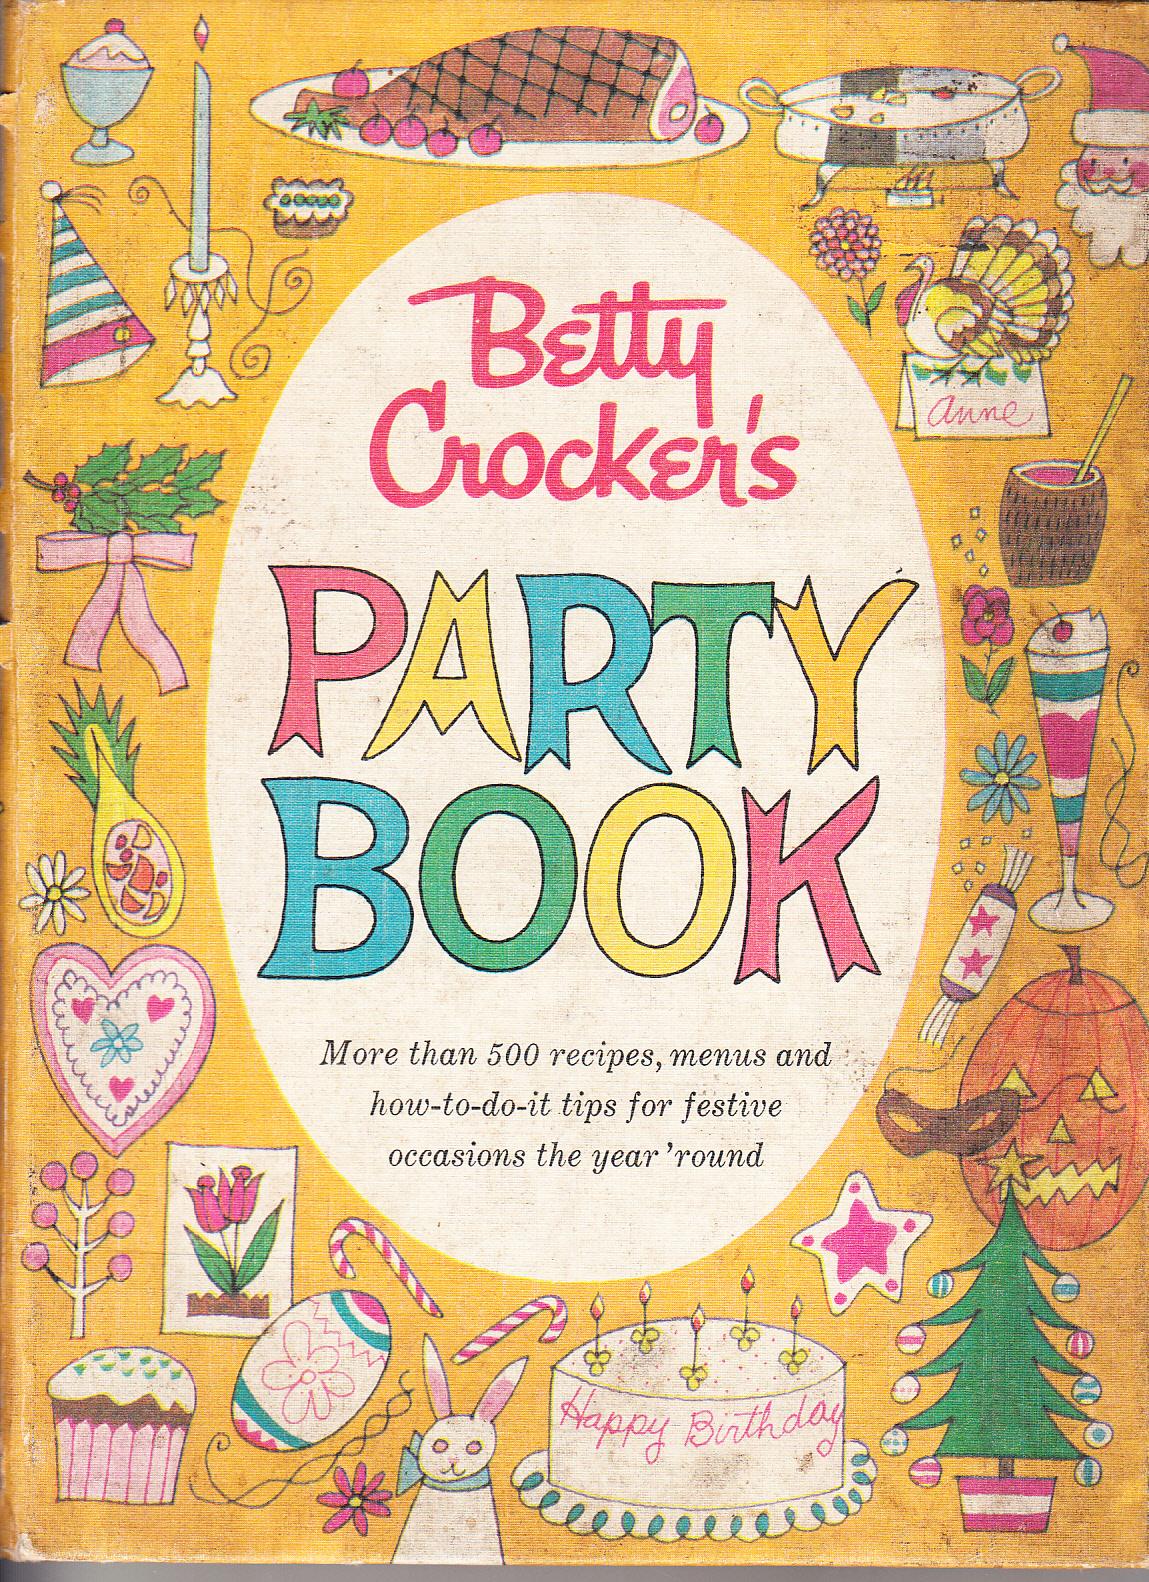 Betty Crockers 1960 Thanksgiving Ideas With Bread Stuffings Frozen Pumpkin Pie More Vintage TBT